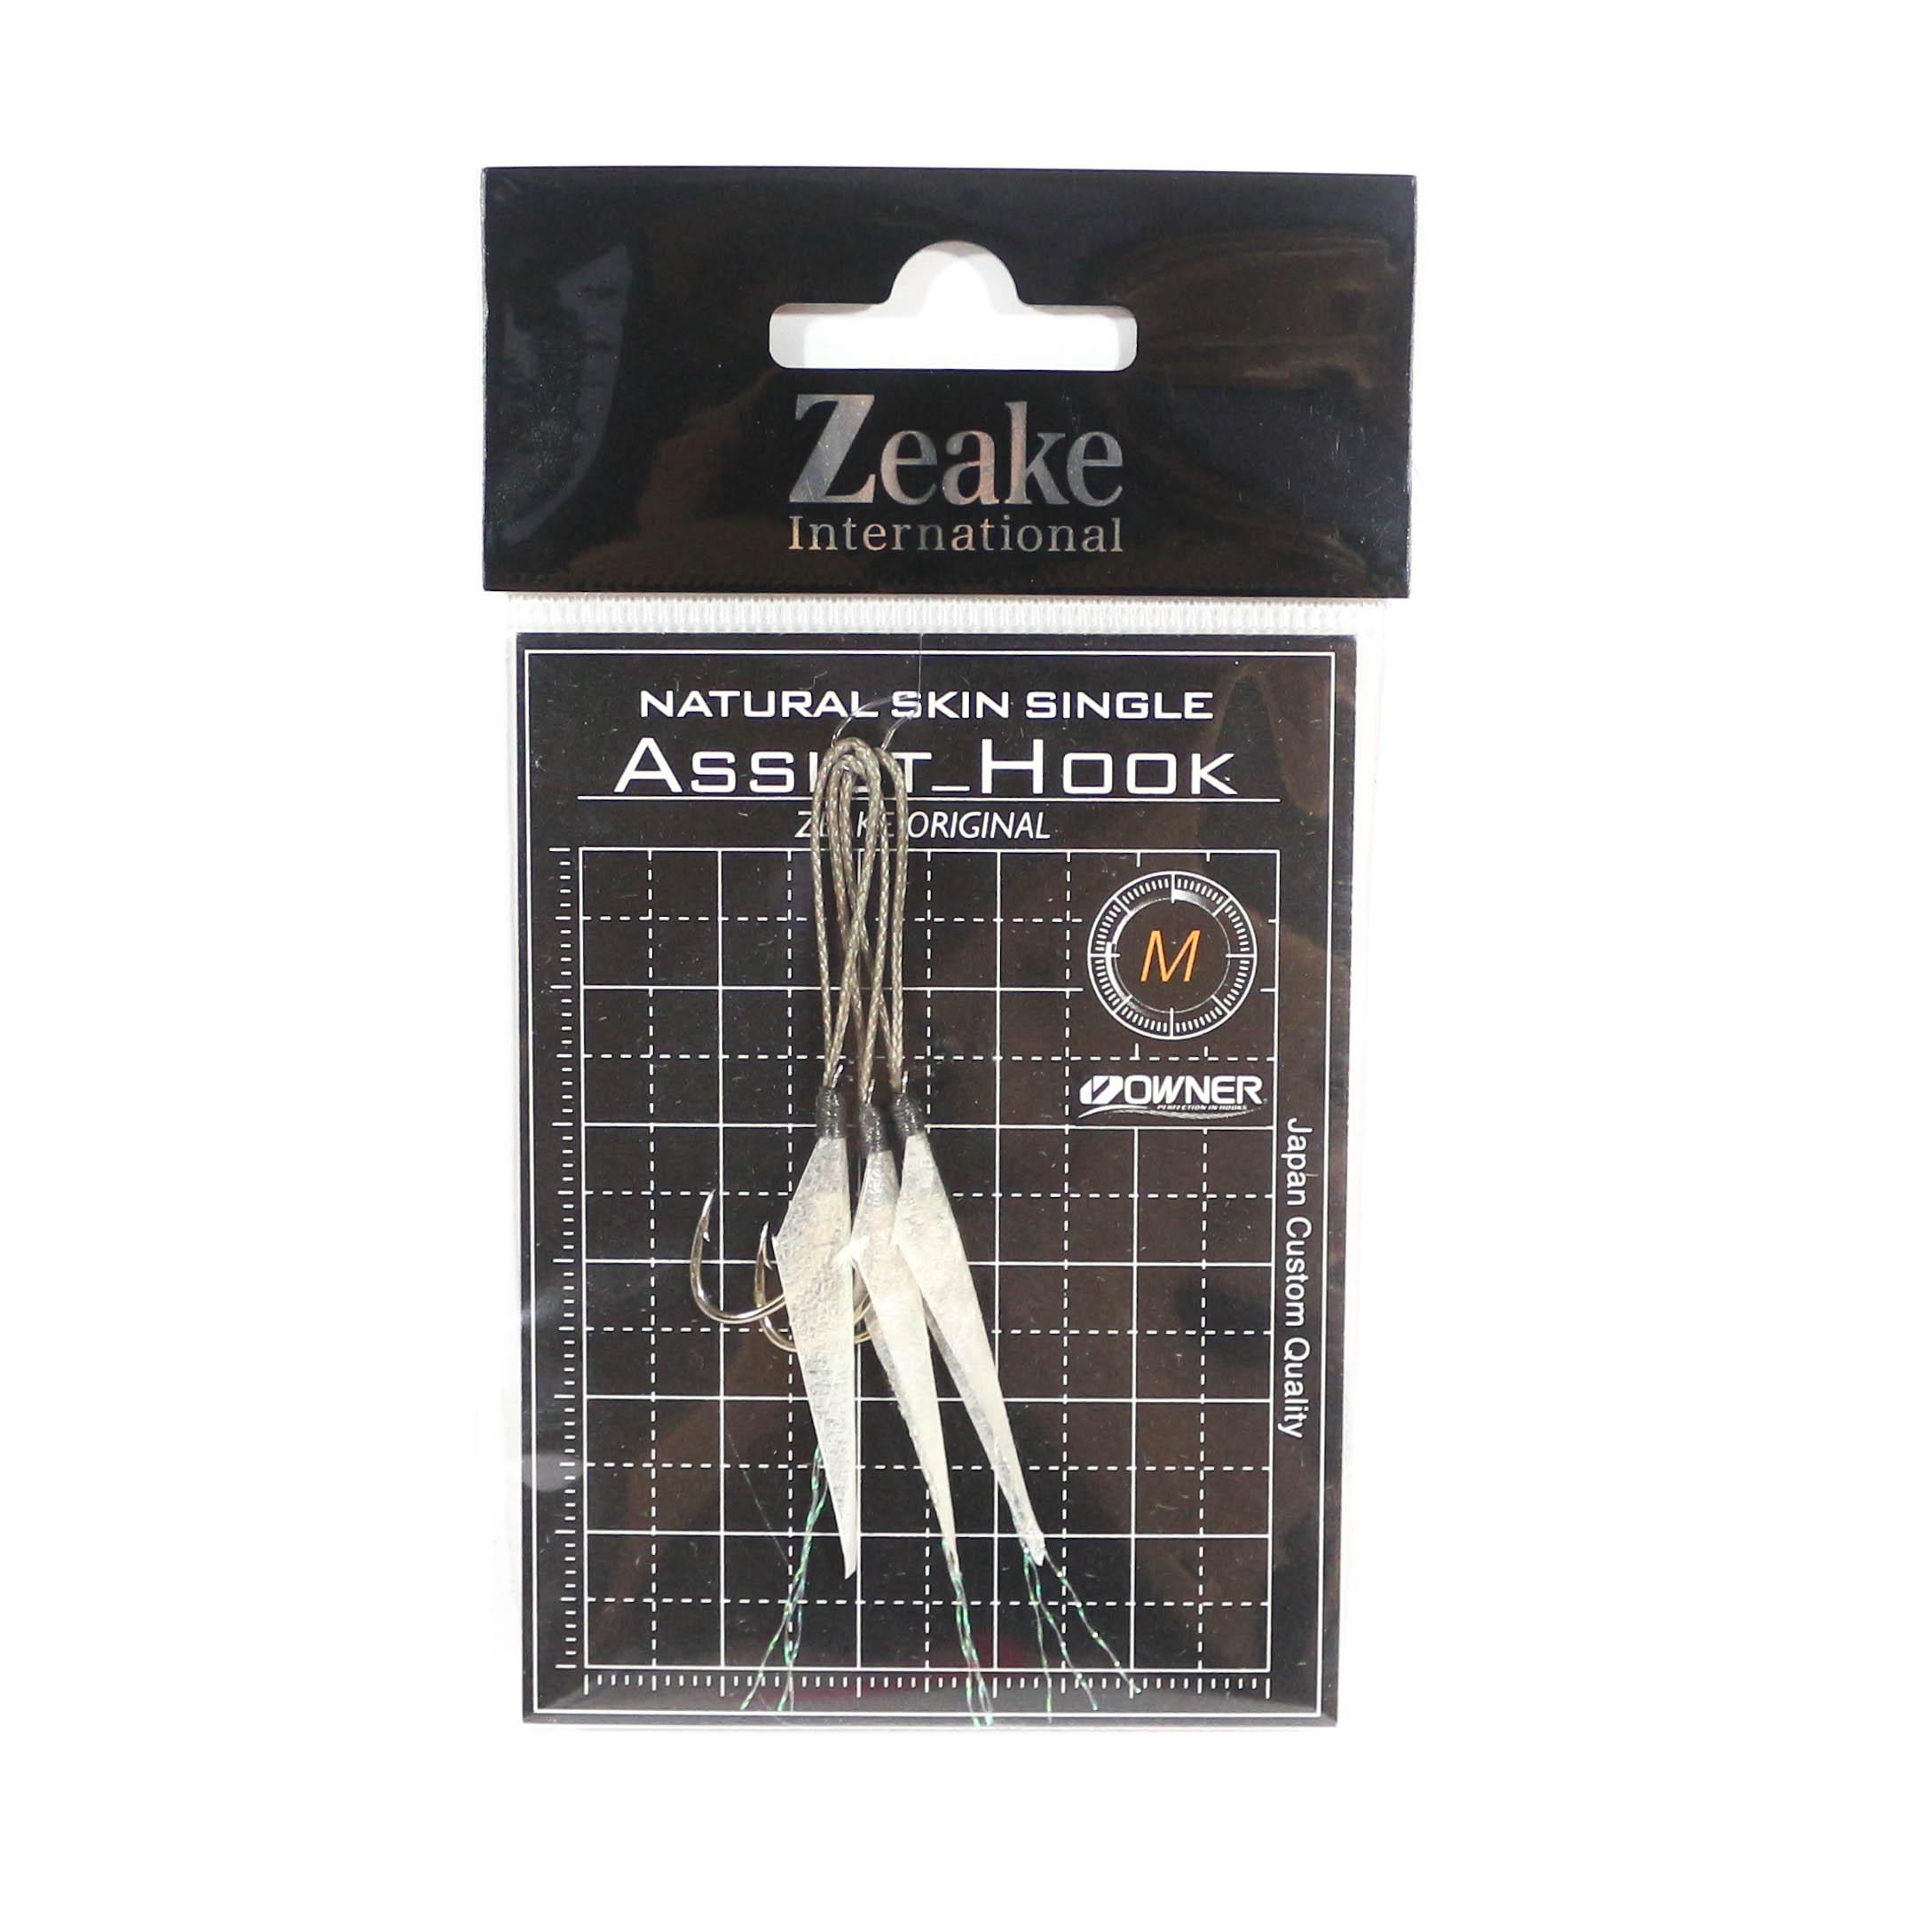 Zeake Assist Hook Single Fish Skin SLJ 3 per pack M (Size 4) (1984)